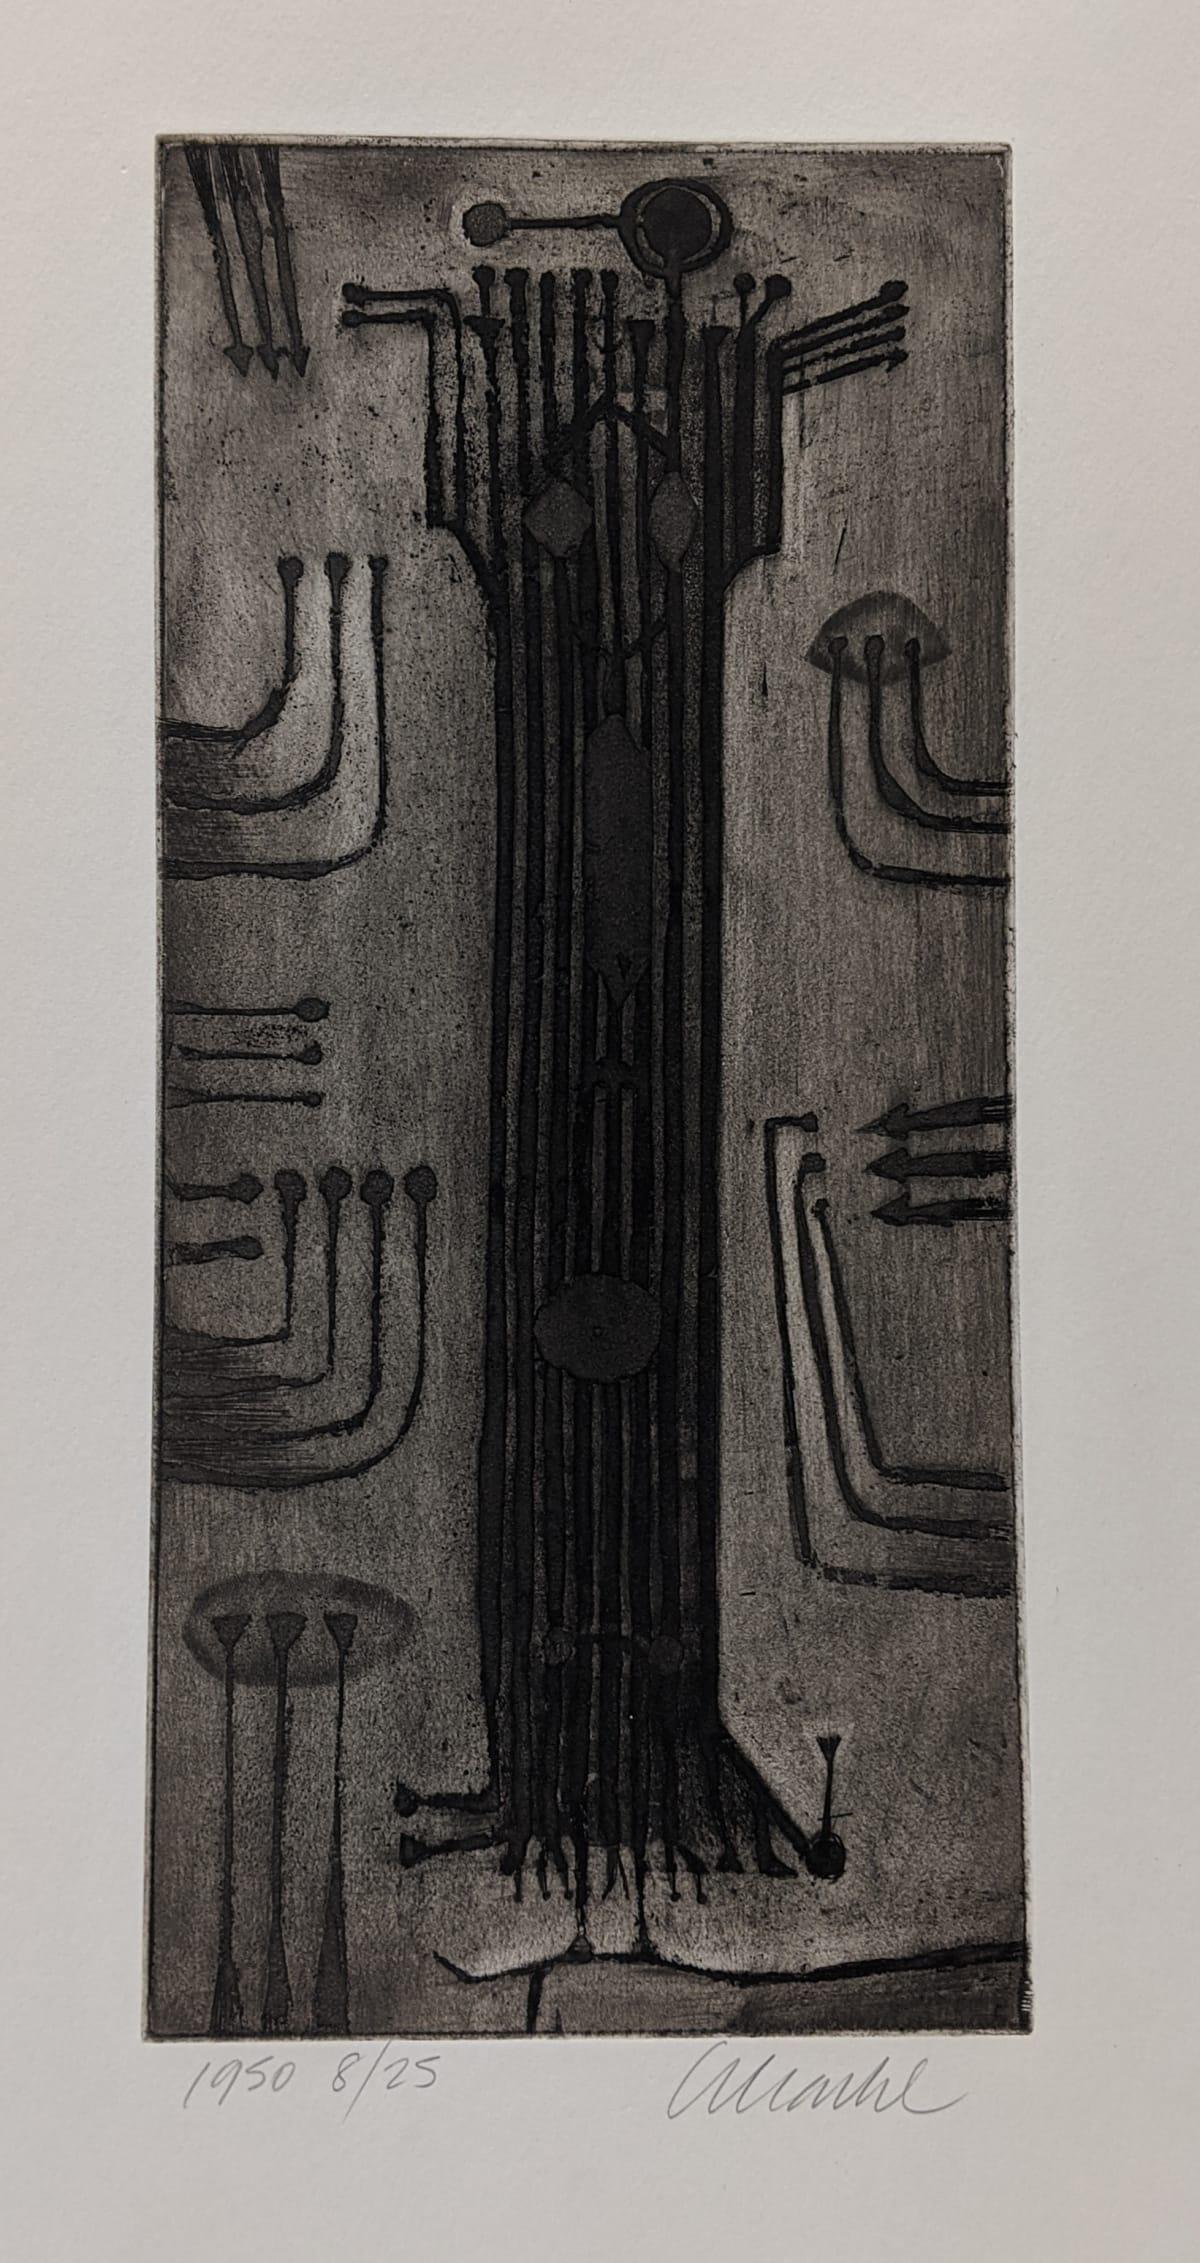 Geoffrey Clarke, Man (vertical format) (69), 1950